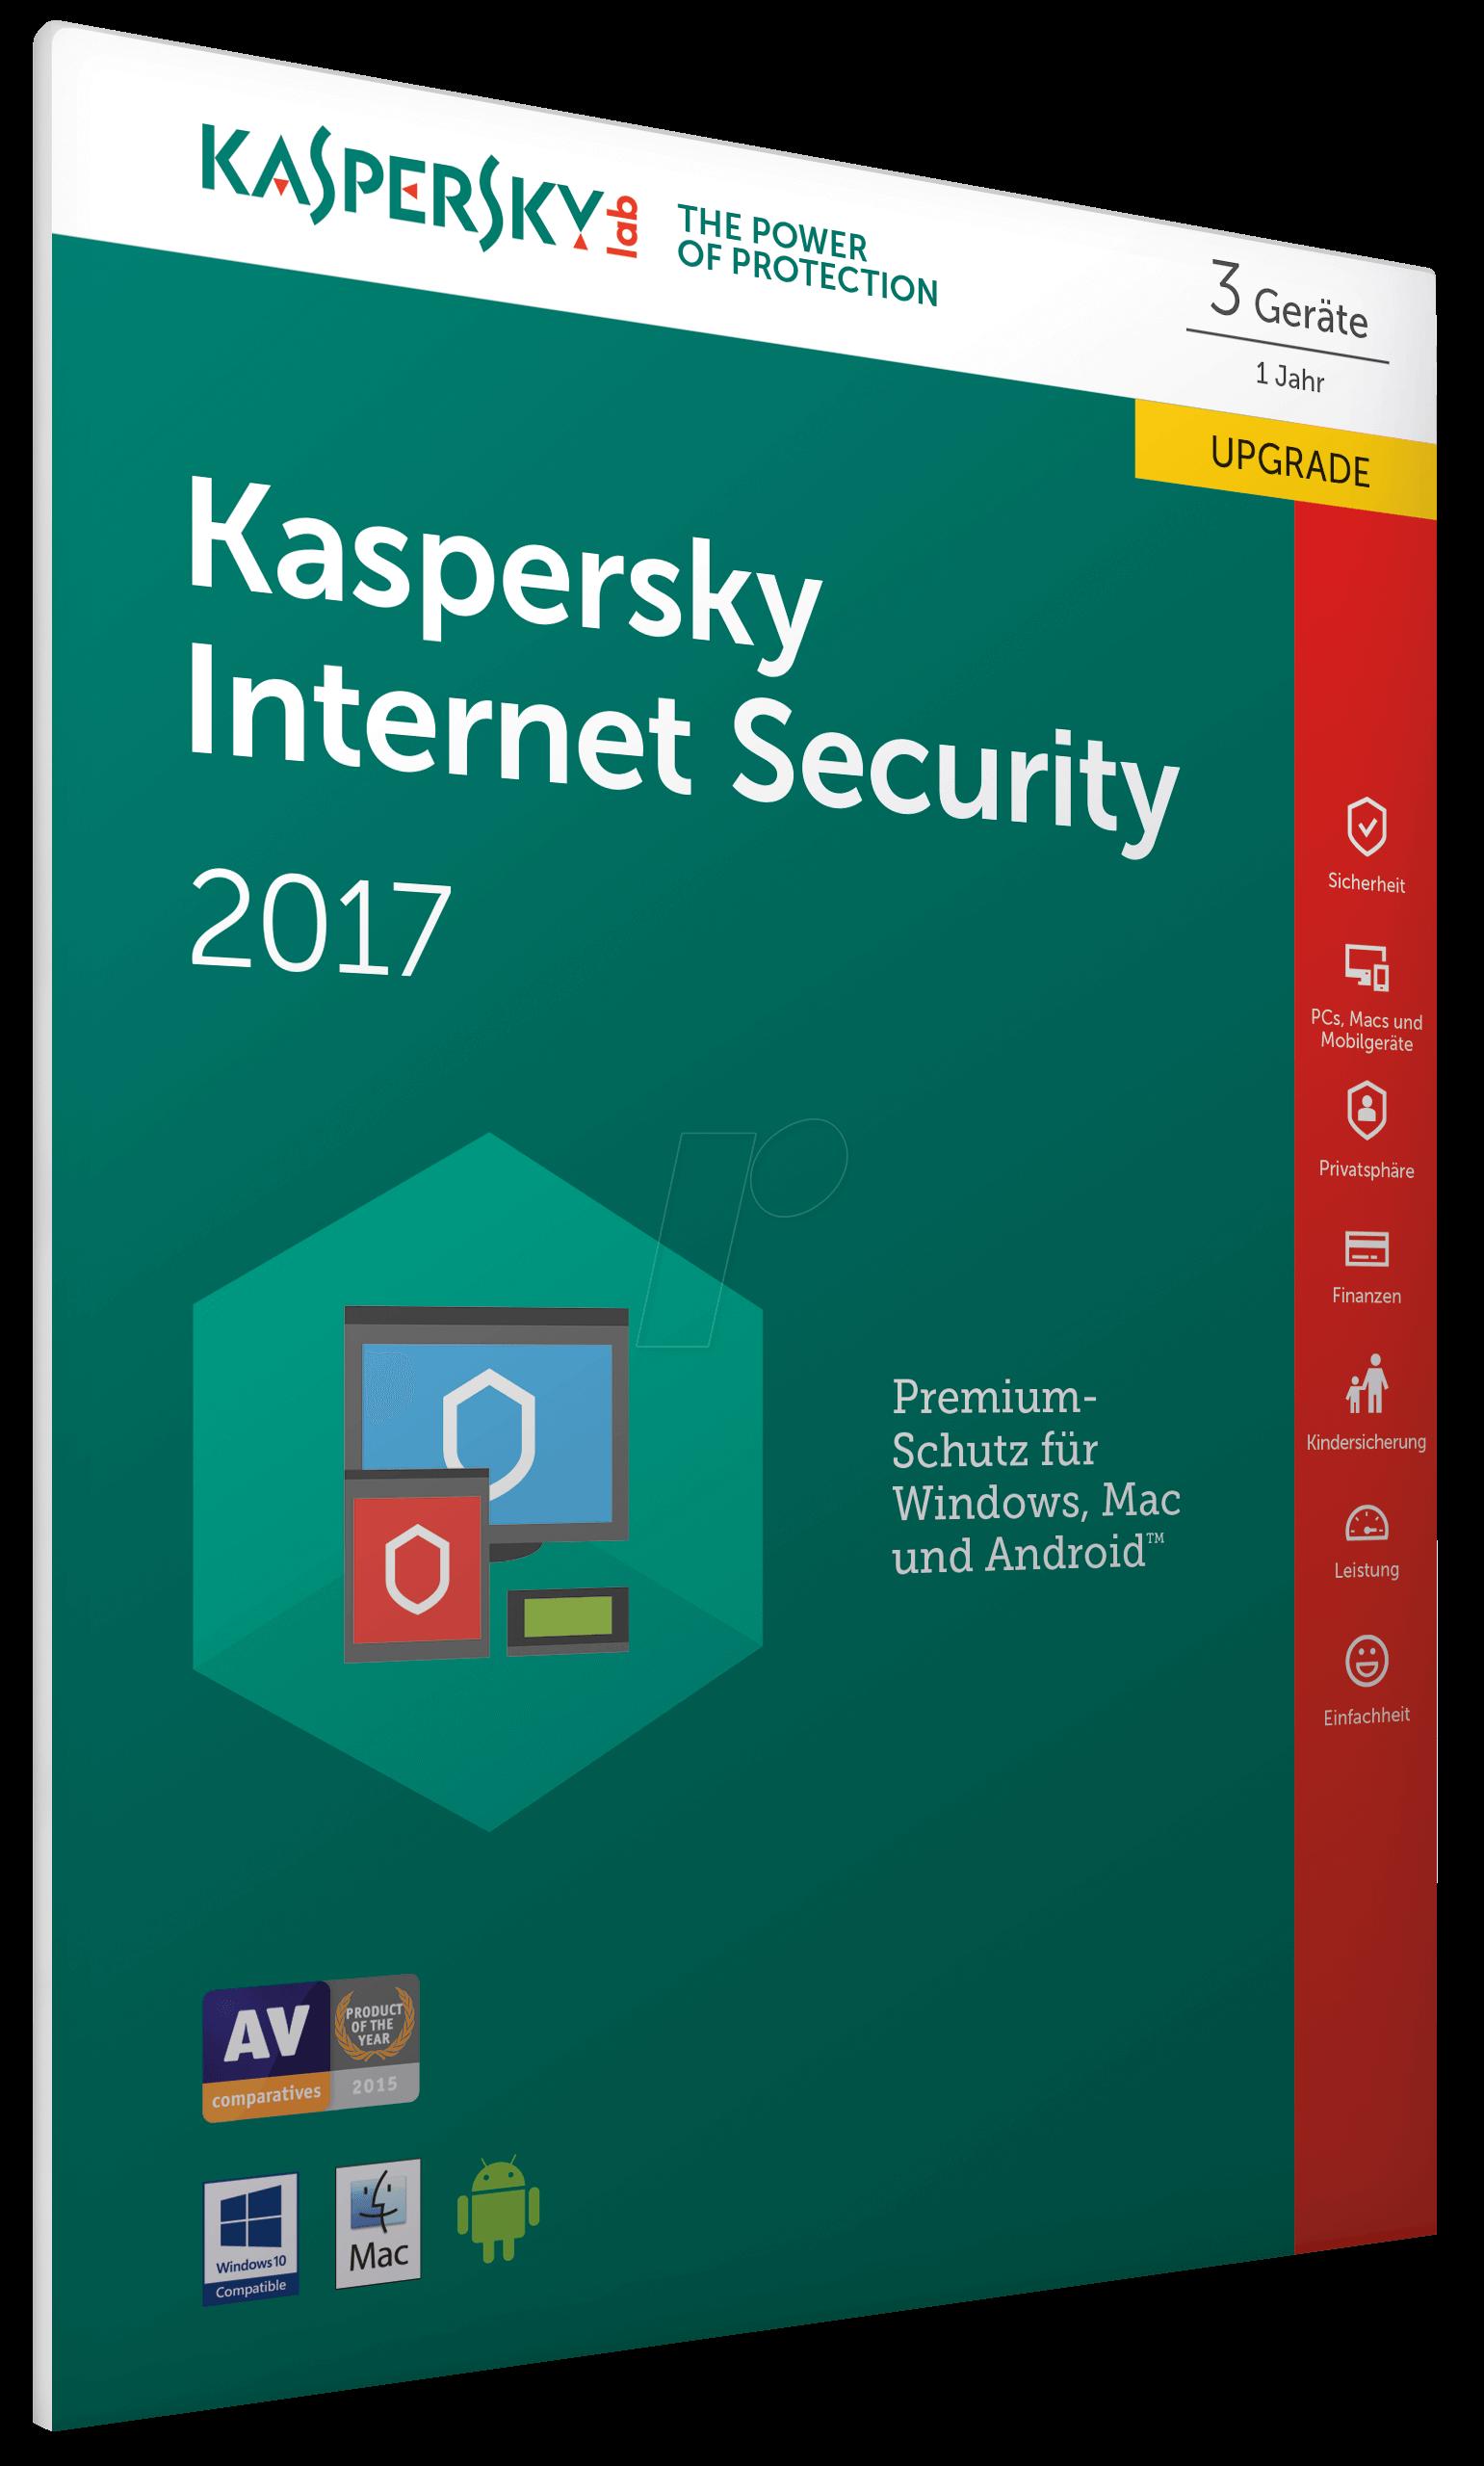 https://cdn-reichelt.de/bilder/web/xxl_ws/G500/KASPERSKY_IS2017_3U_UPG_01.png